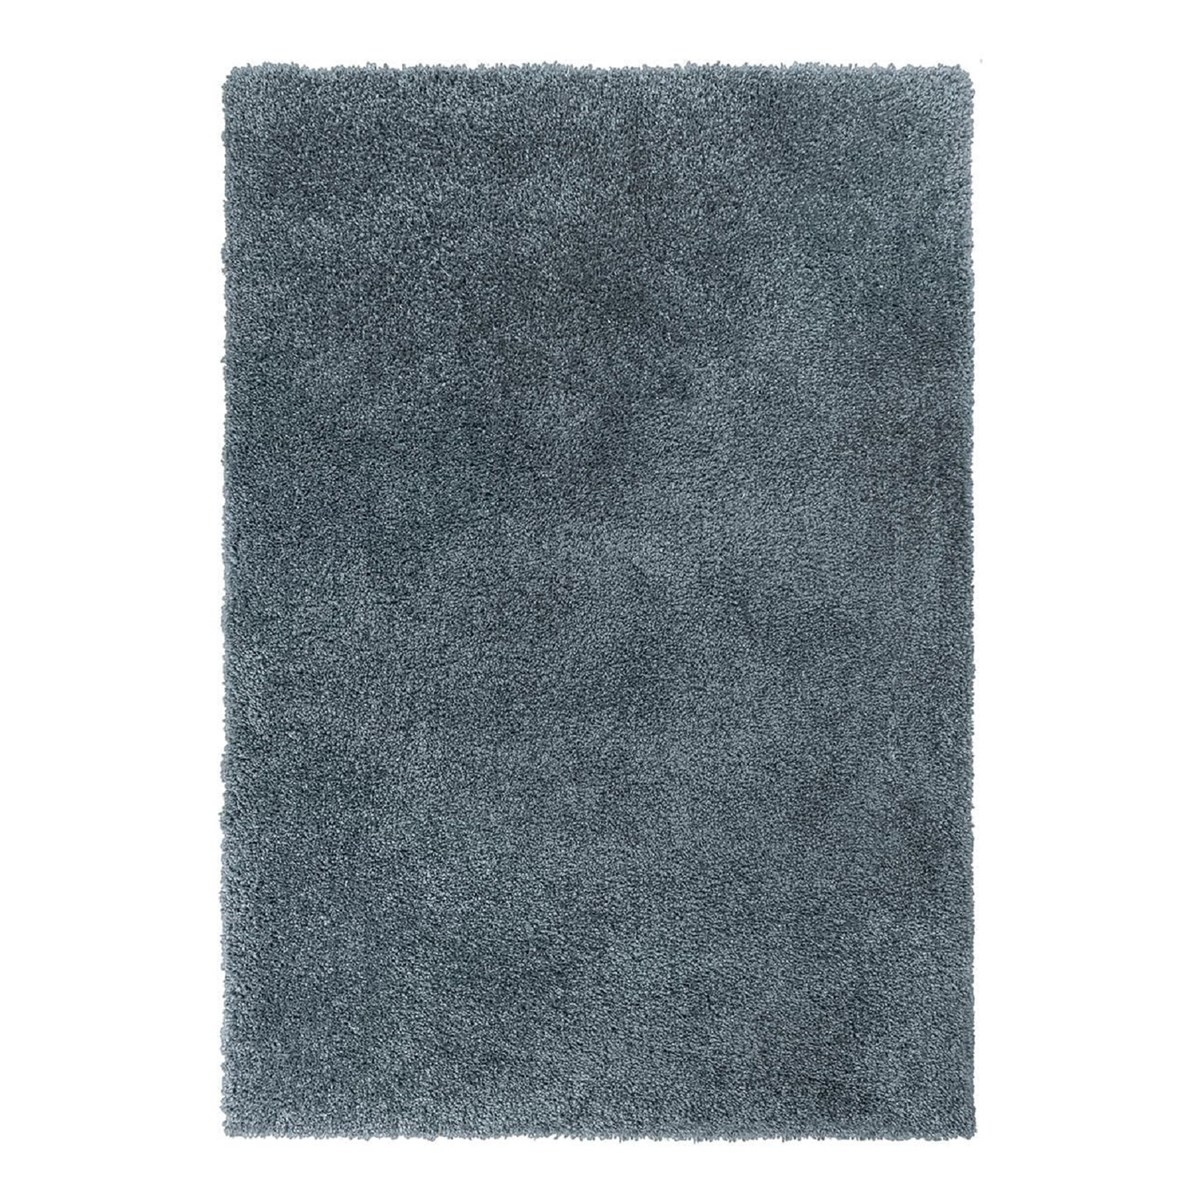 Tapis shaggy en Polyester Bleu 160x230 cm